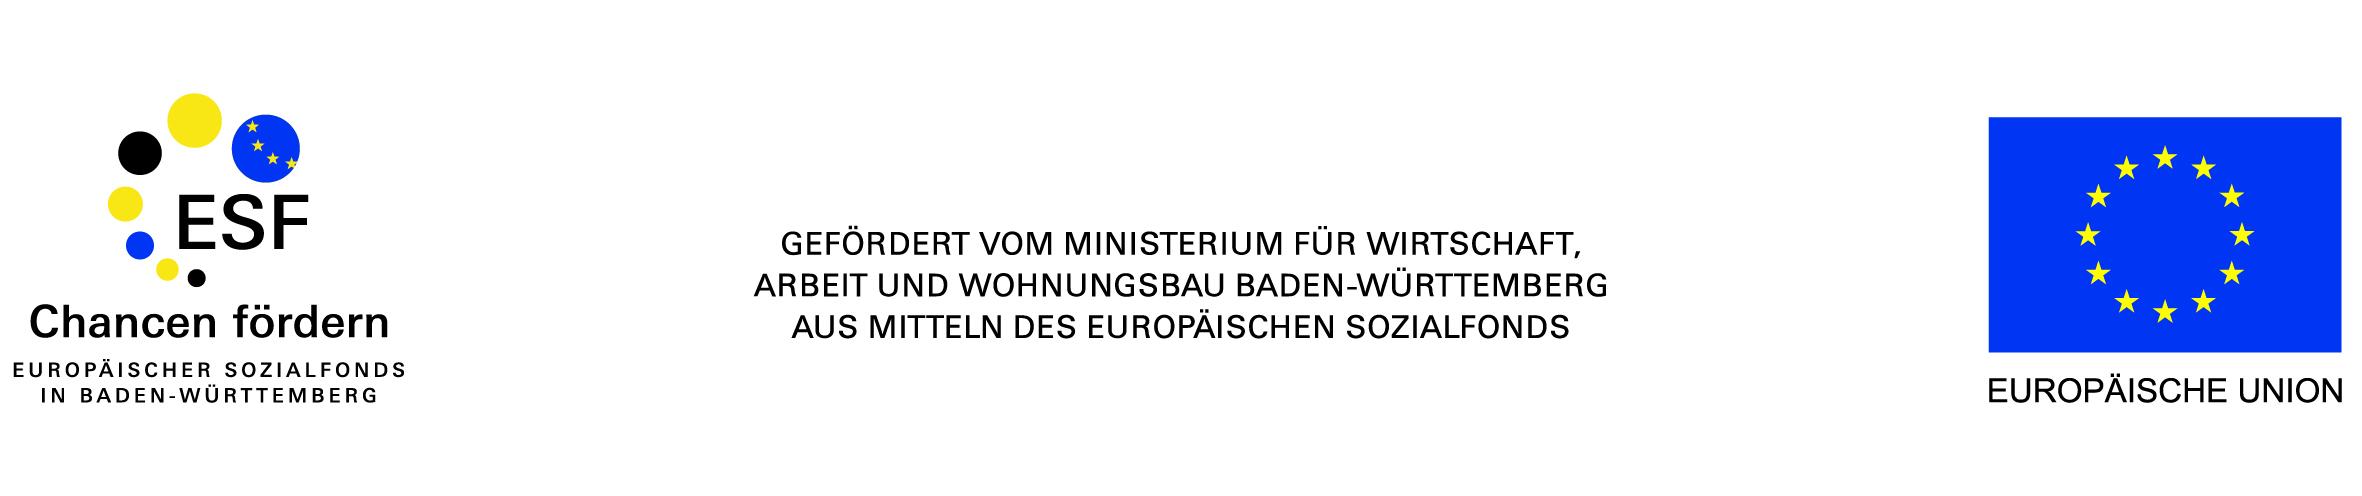 neue_logoreihe_wm-esf_tra__ger